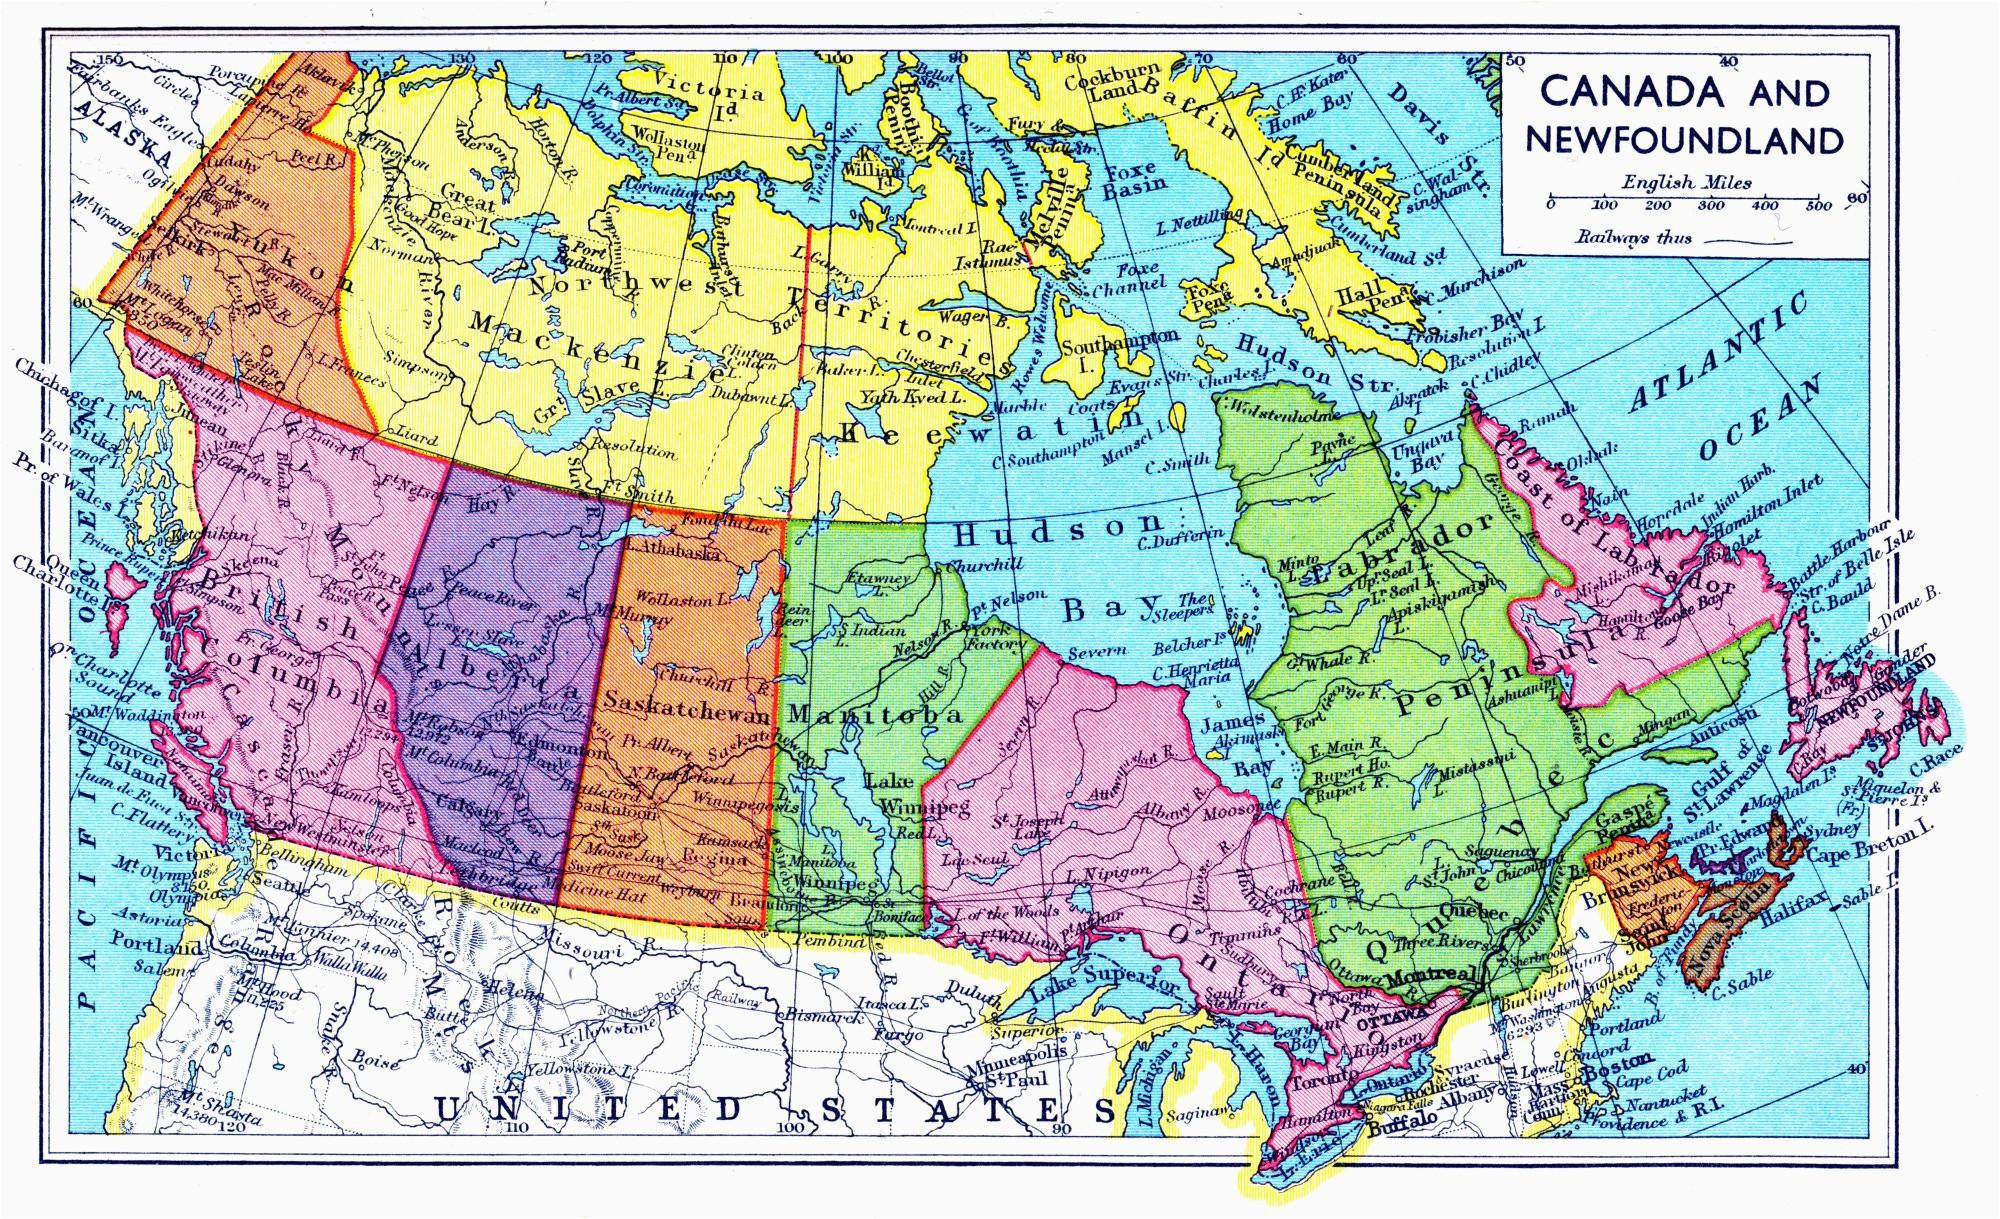 California Live Earthquake Map Canada Earthquake Map Pics World Map Floor Puzzle New Map Od Canada